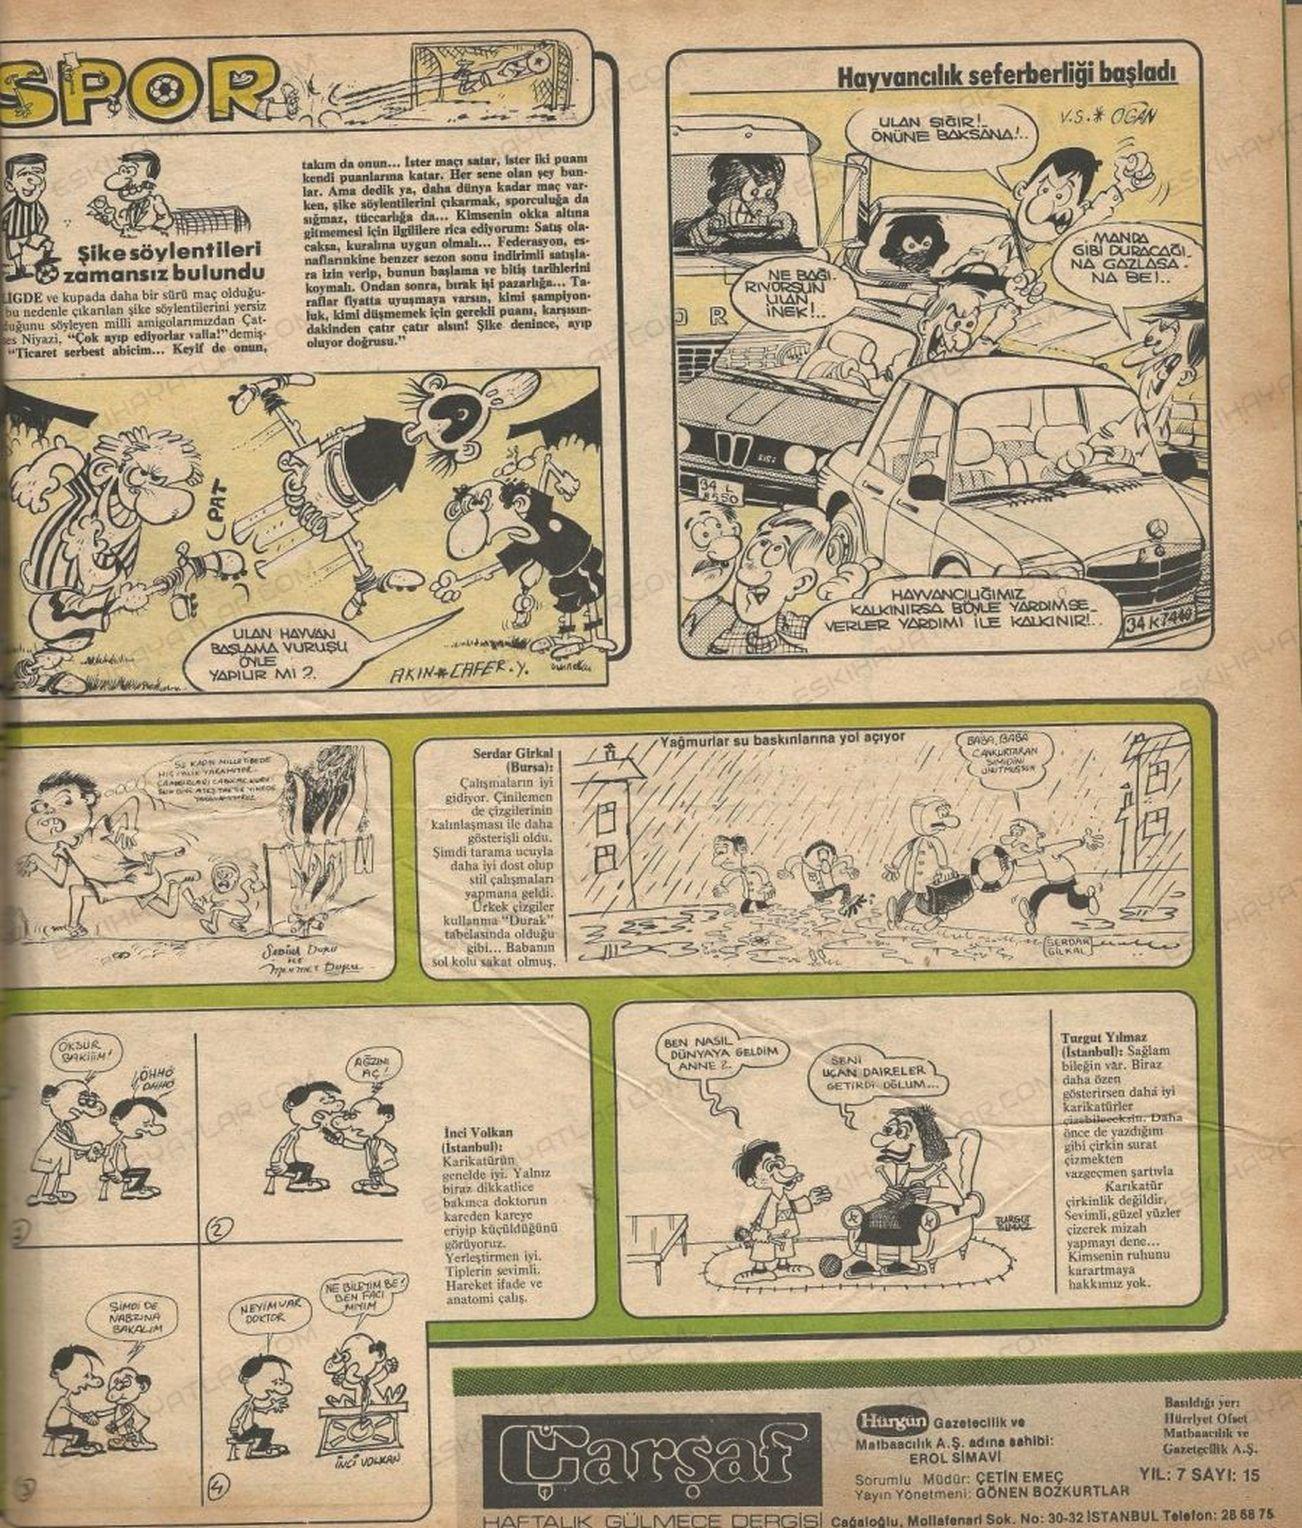 0526-carsaf-dergisi-seksenlerde-karikatur-dergileri-7-nisan-1982-tarihli-gazete (13)